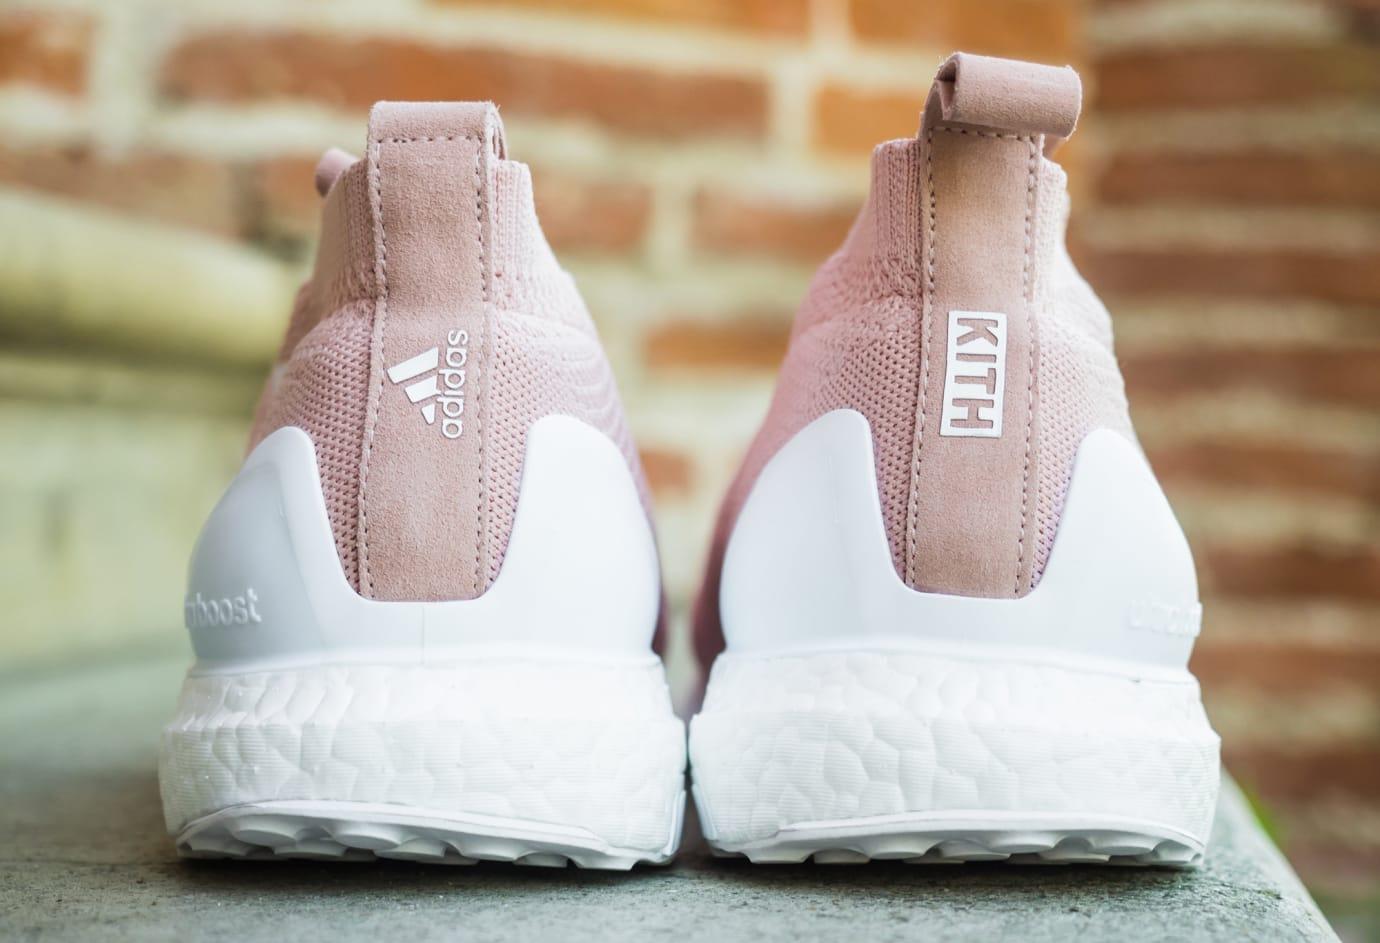 new product 9ce98 0eb3b ... Kith Adidas Ultra Boost Ace 16 Pure Control Flamingo Heel